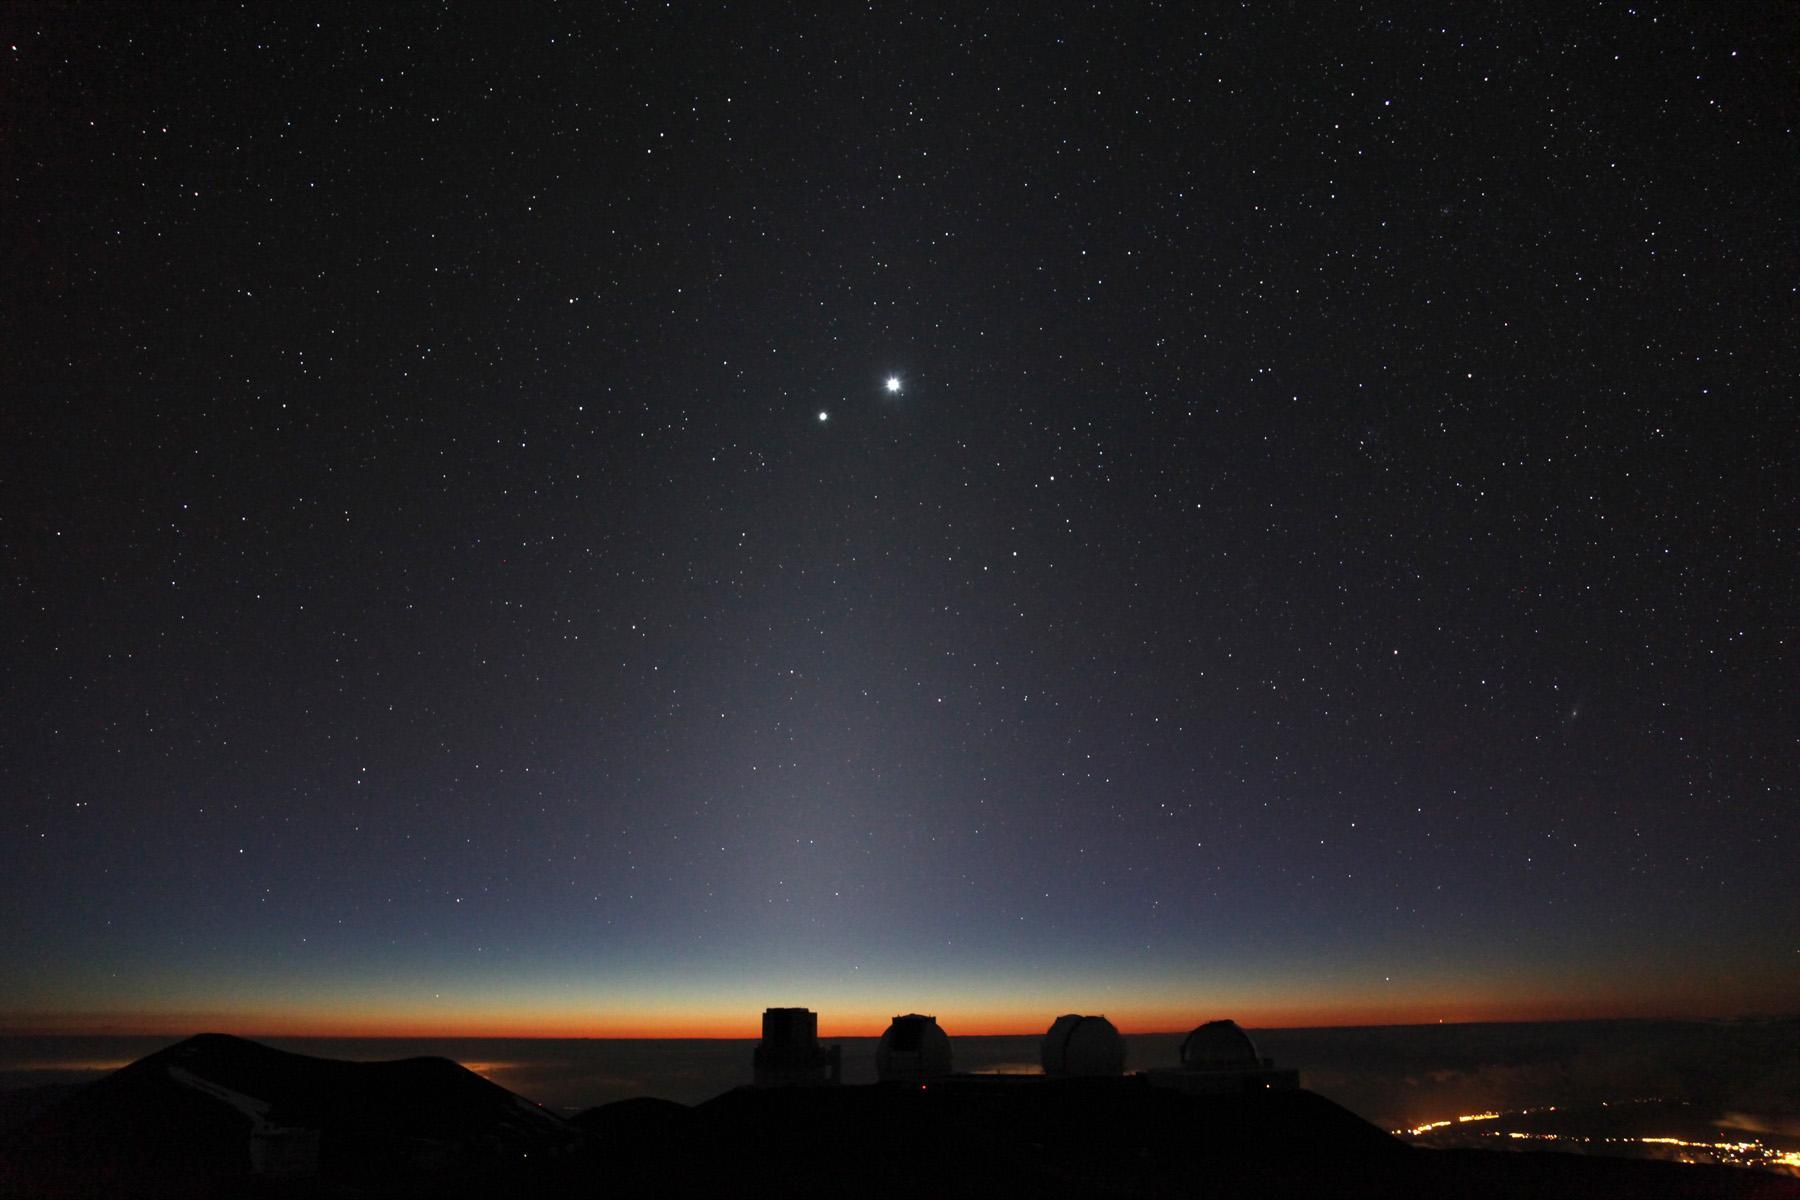 Close Planetary Encounter Seen above Mauna Kea Figure